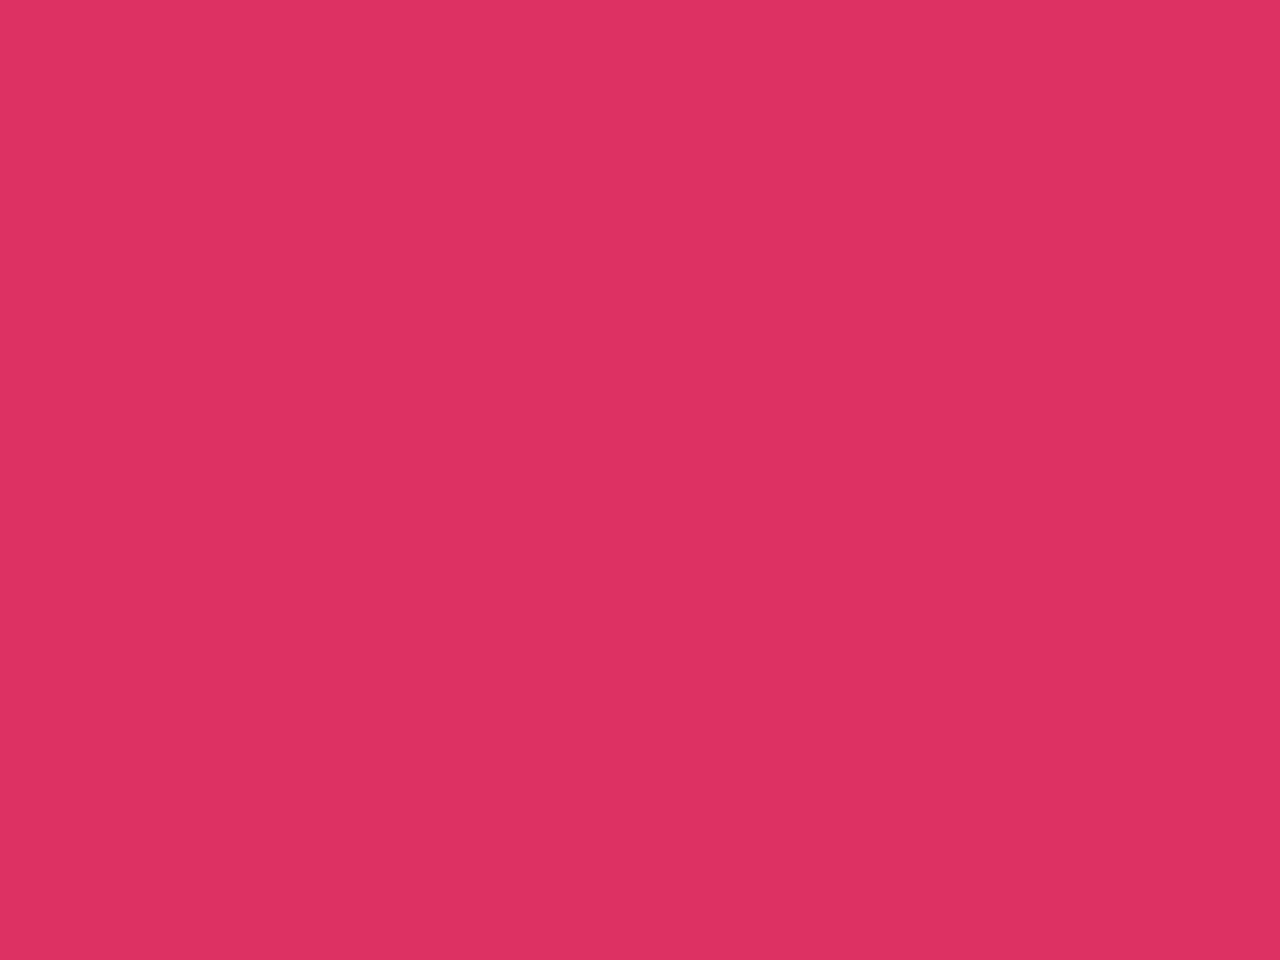 1280x960 Cerise Solid Color Background